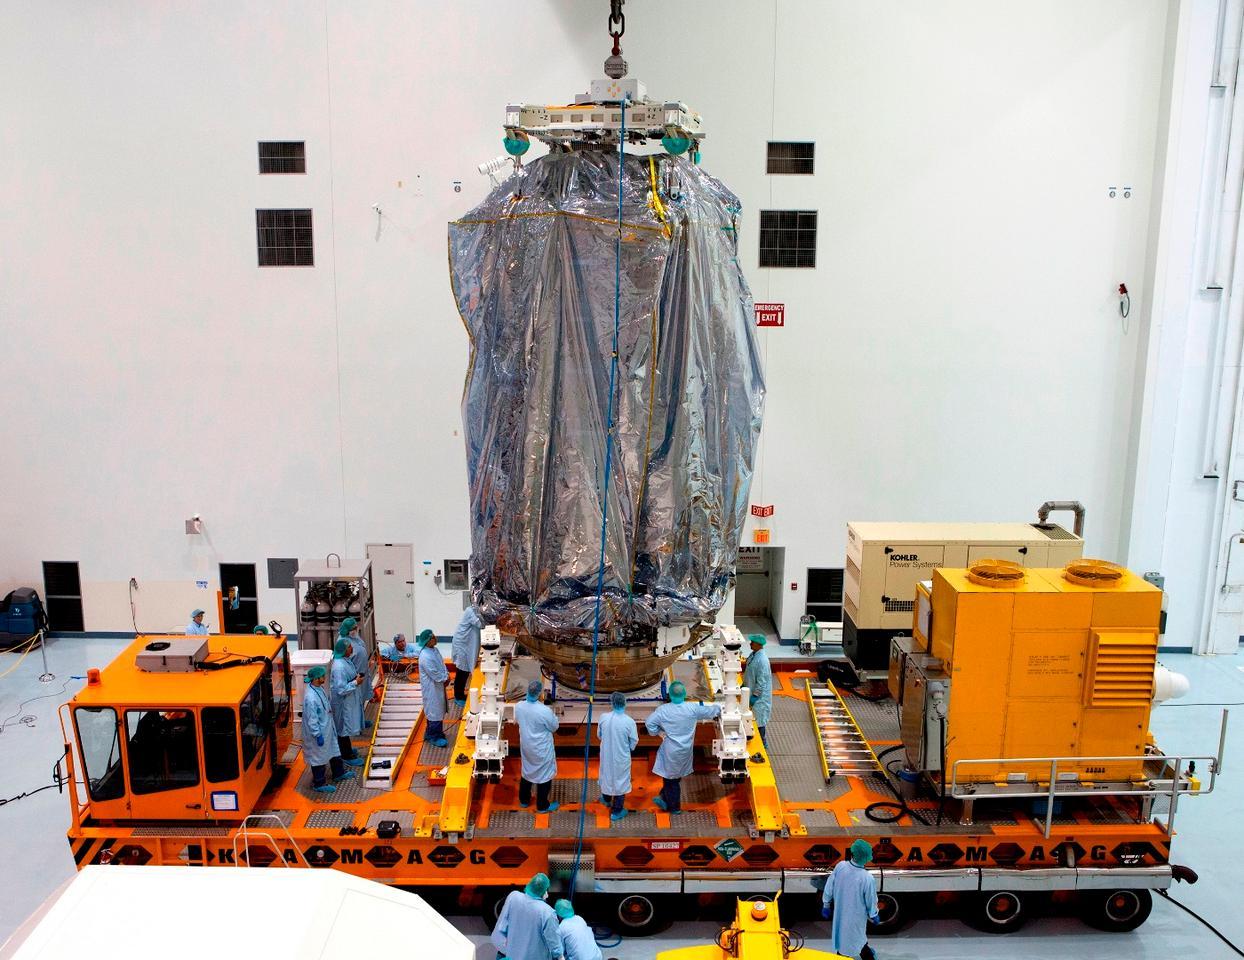 Cygnus spacecraft prepared to move